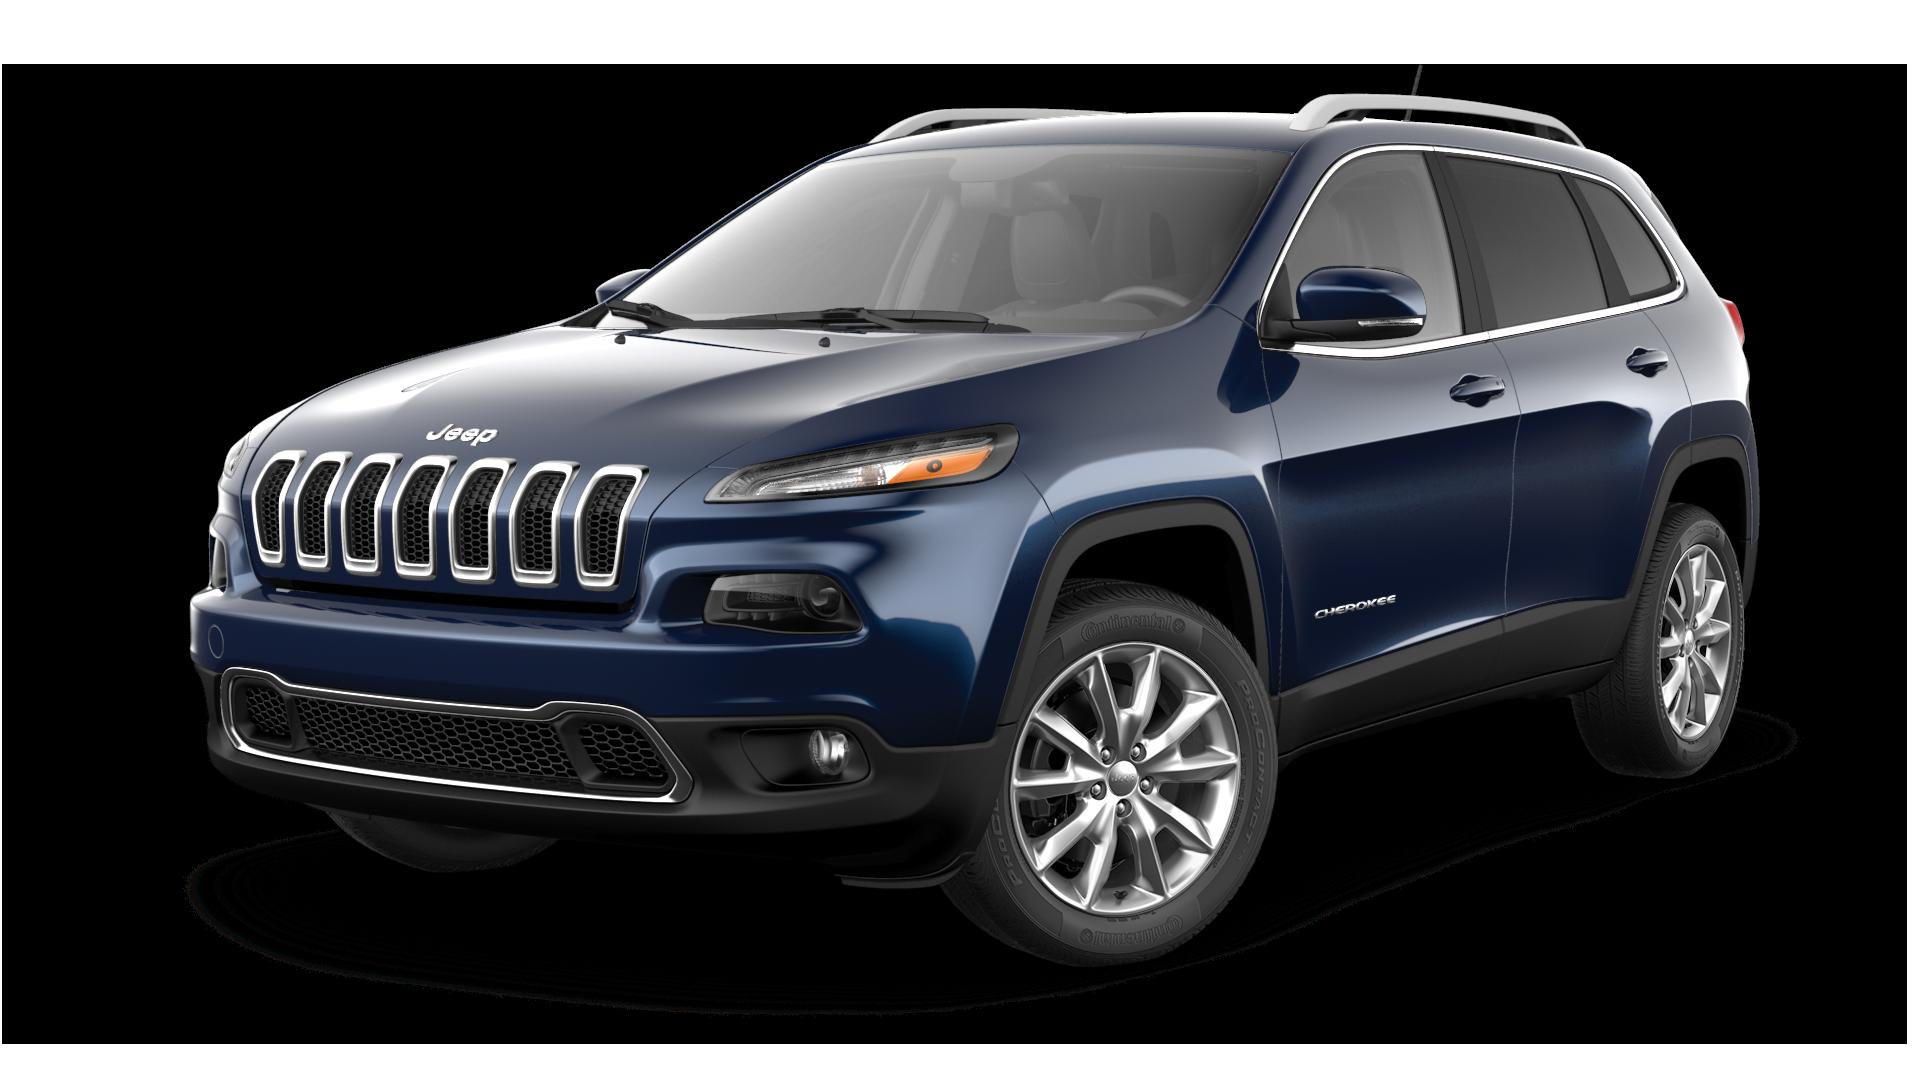 Jeep Patriot Lease >> Jeep & Chrysler Sale | Acton Chrysler Dodge Jeep Ram